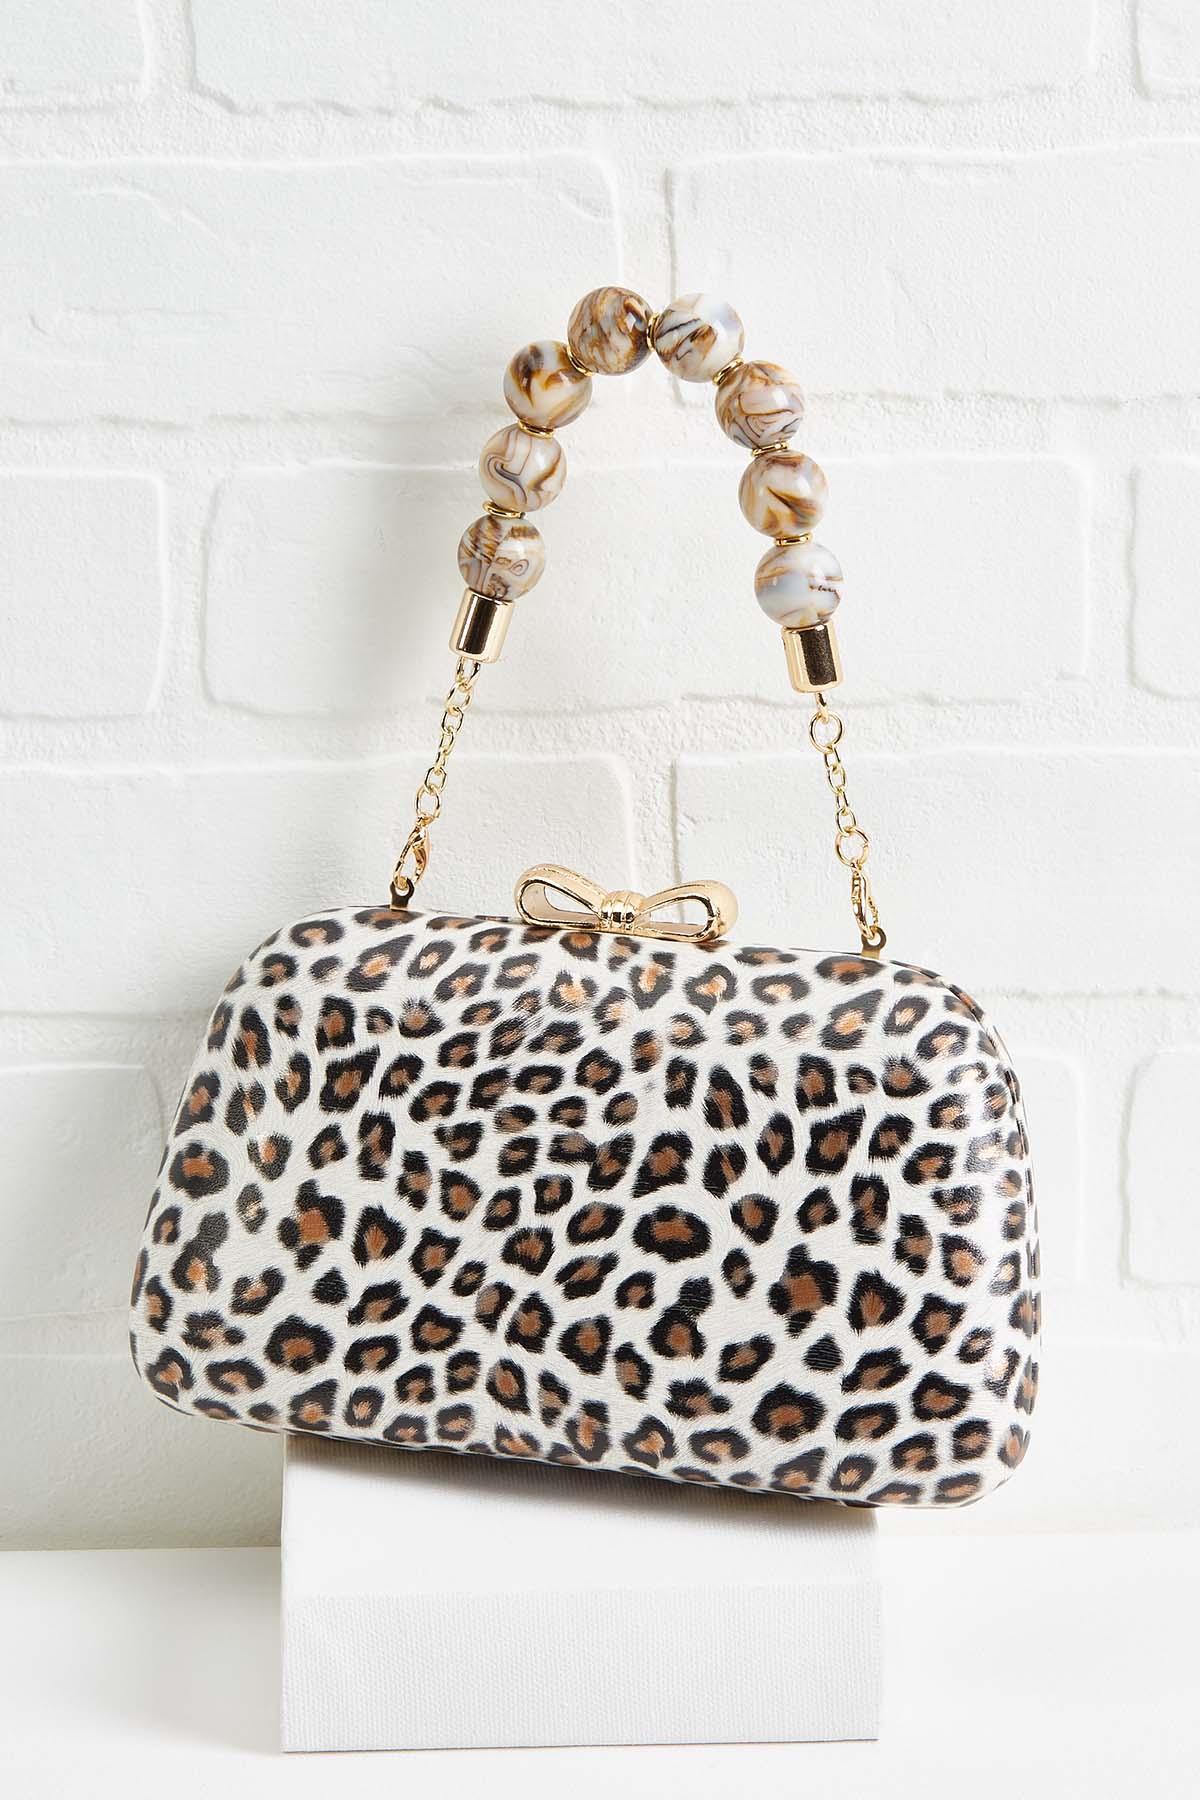 Lovely Leopard Purse